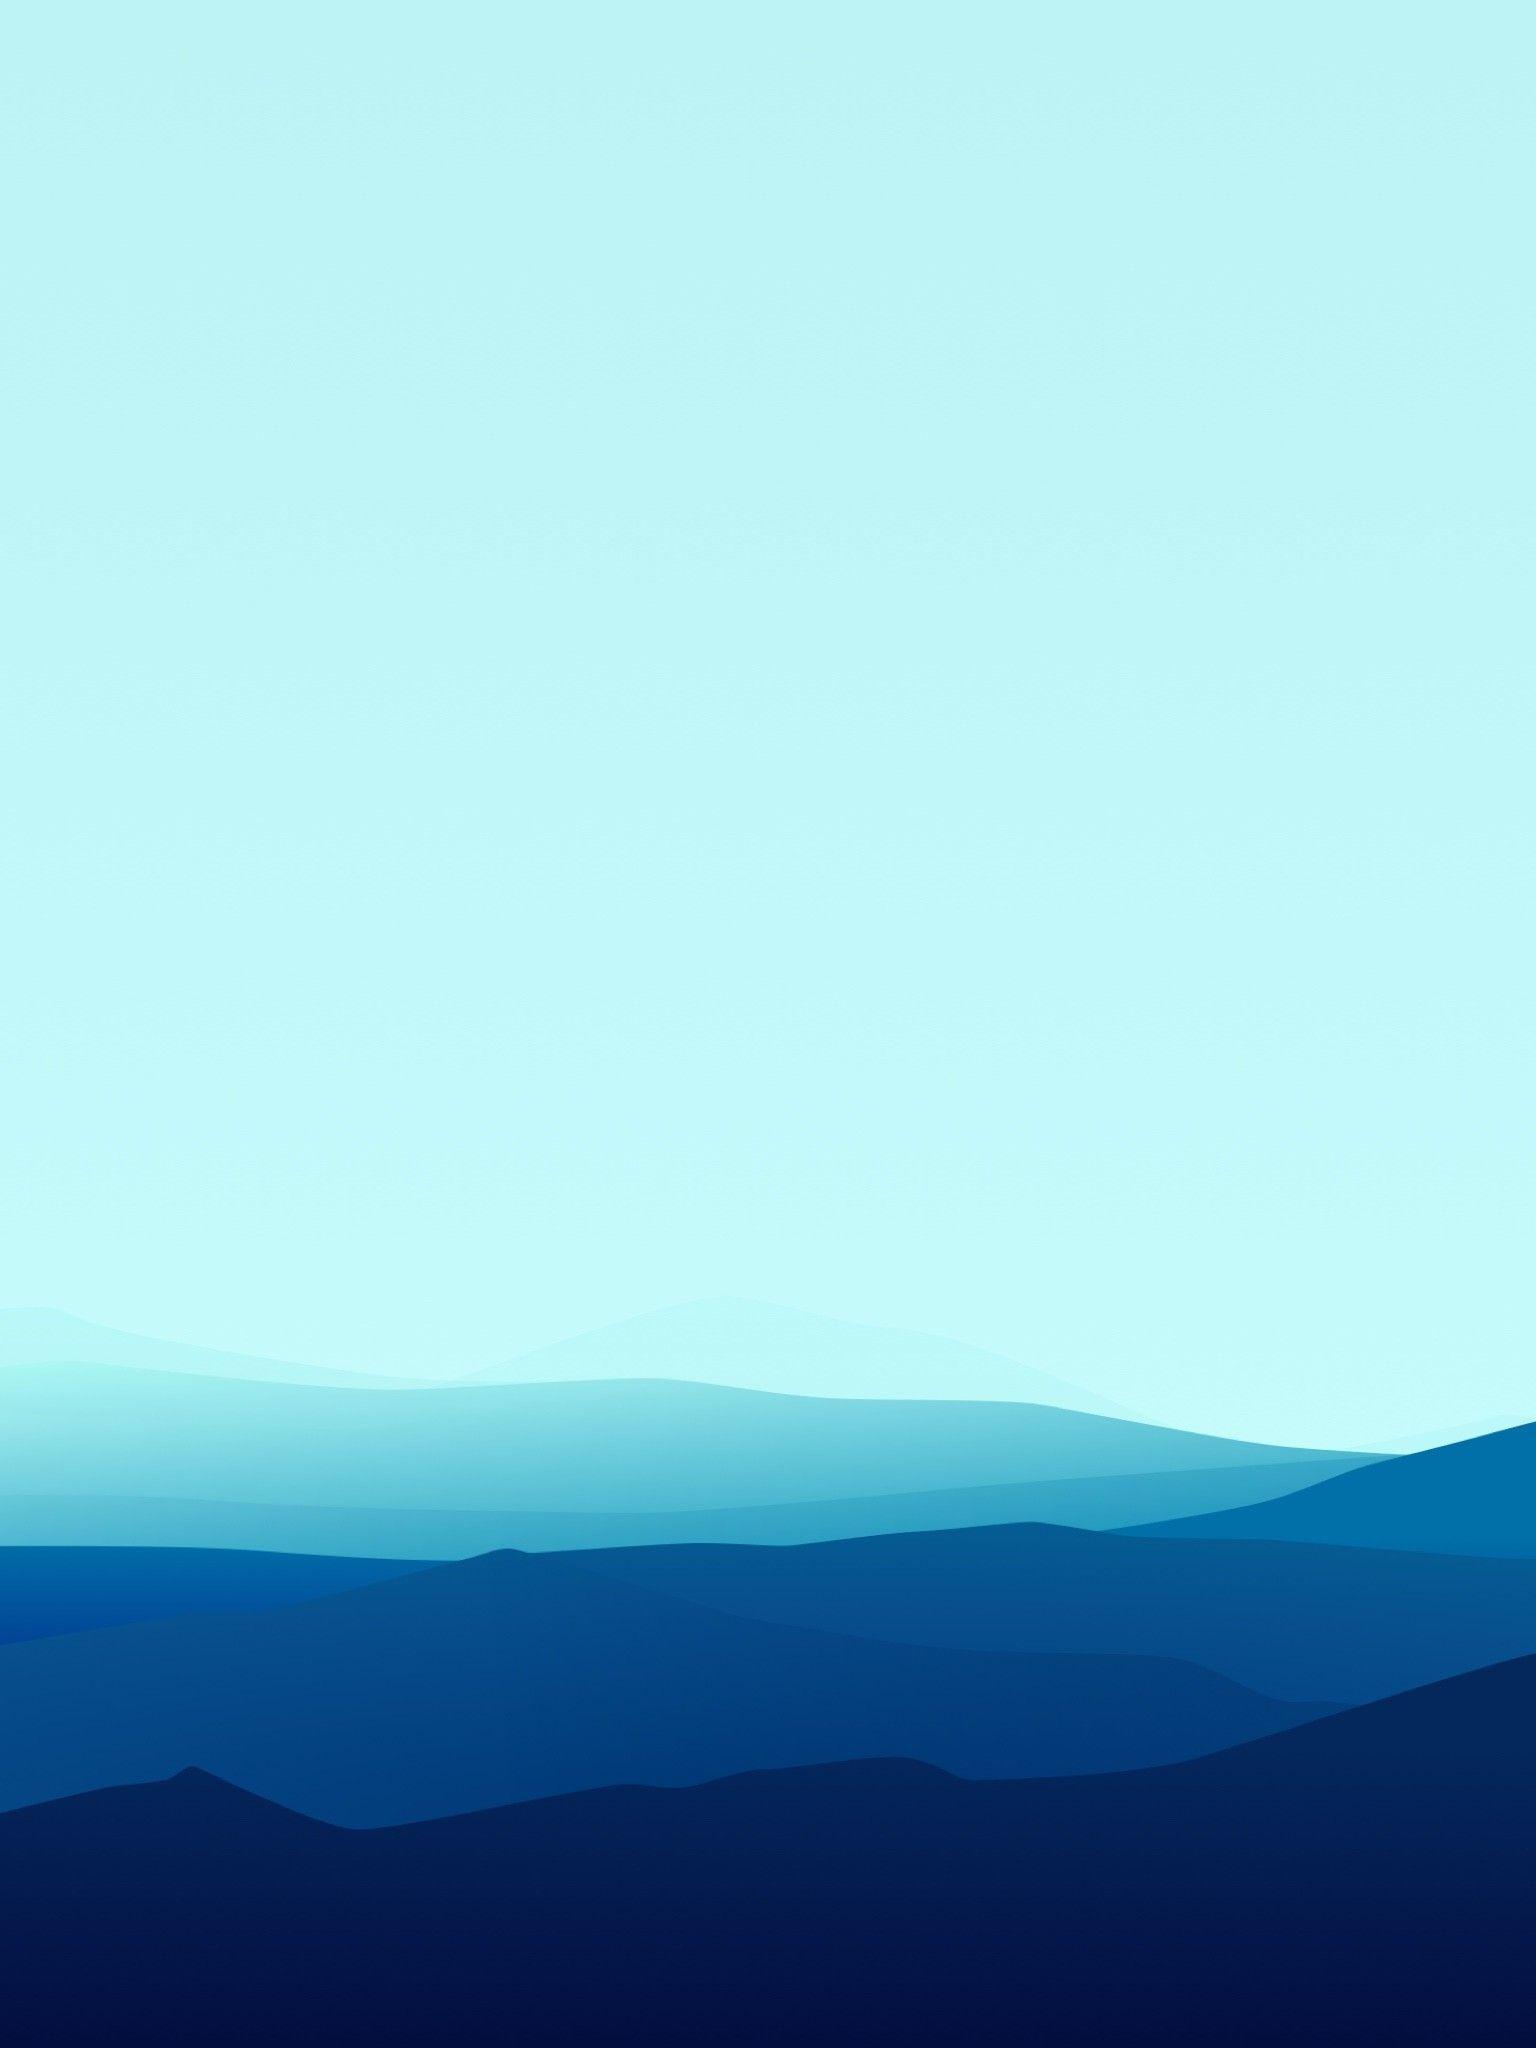 Minimalist Ipad Wallpapers Top Free Minimalist Ipad Backgrounds Wallpaperaccess